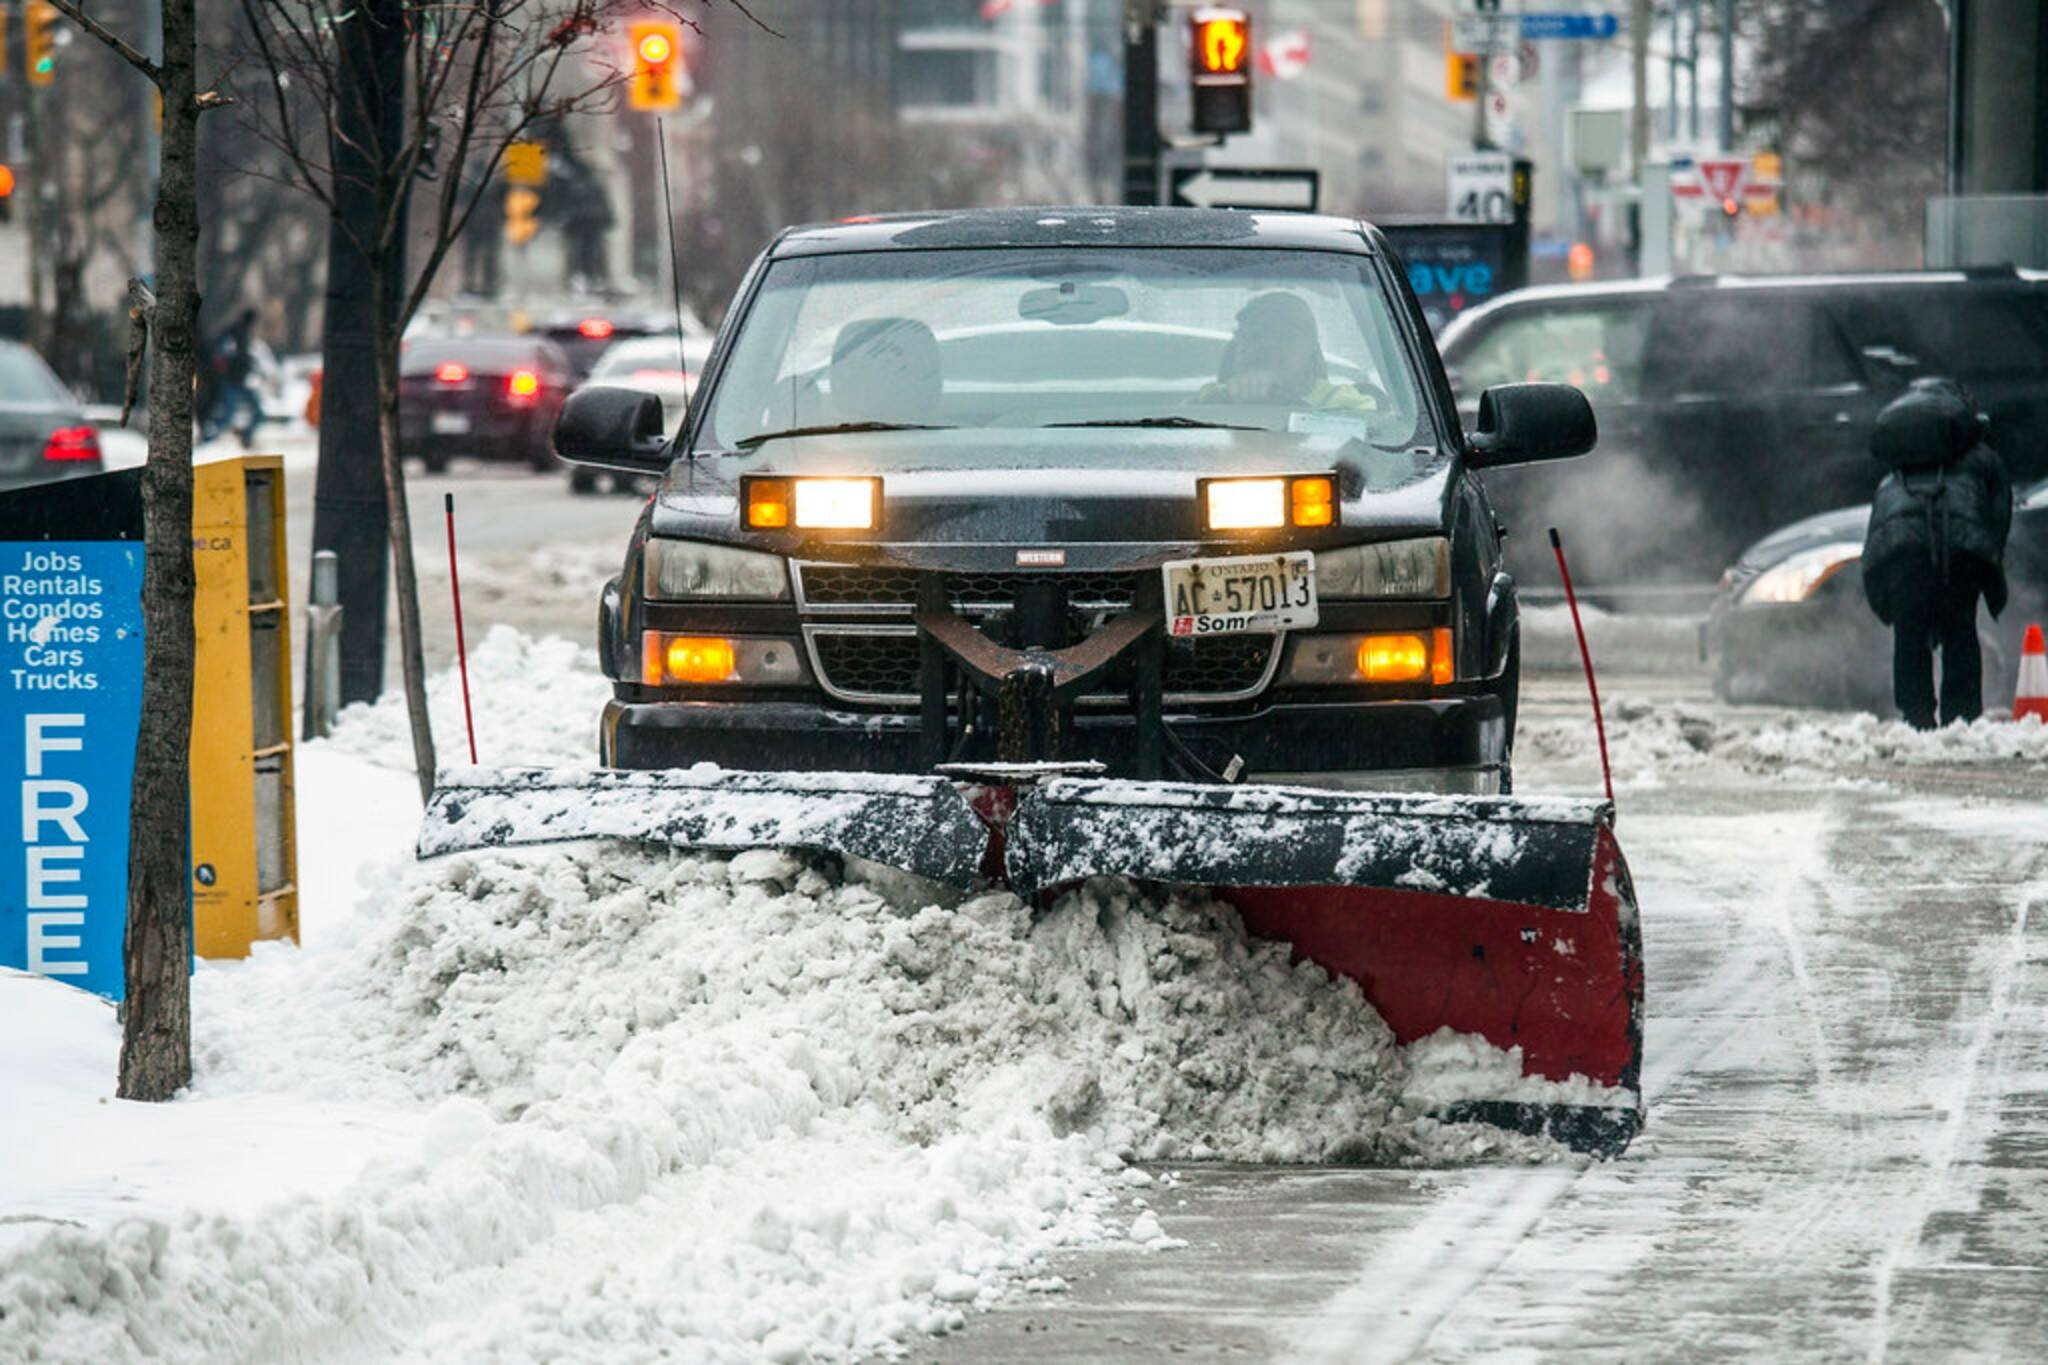 city of toronto snow removal